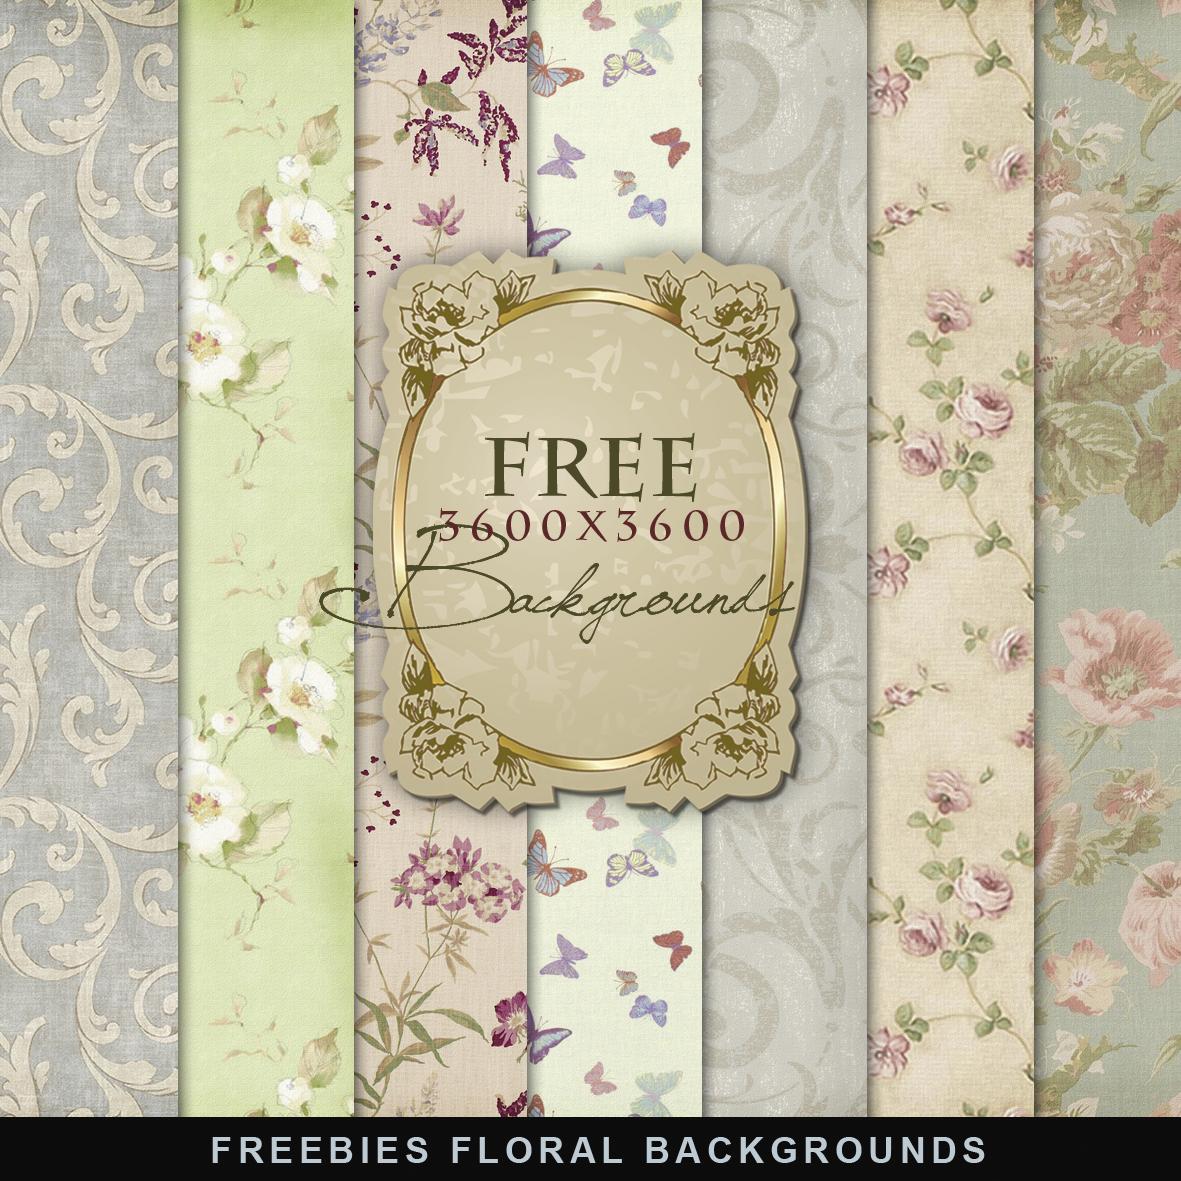 Freebies floral background